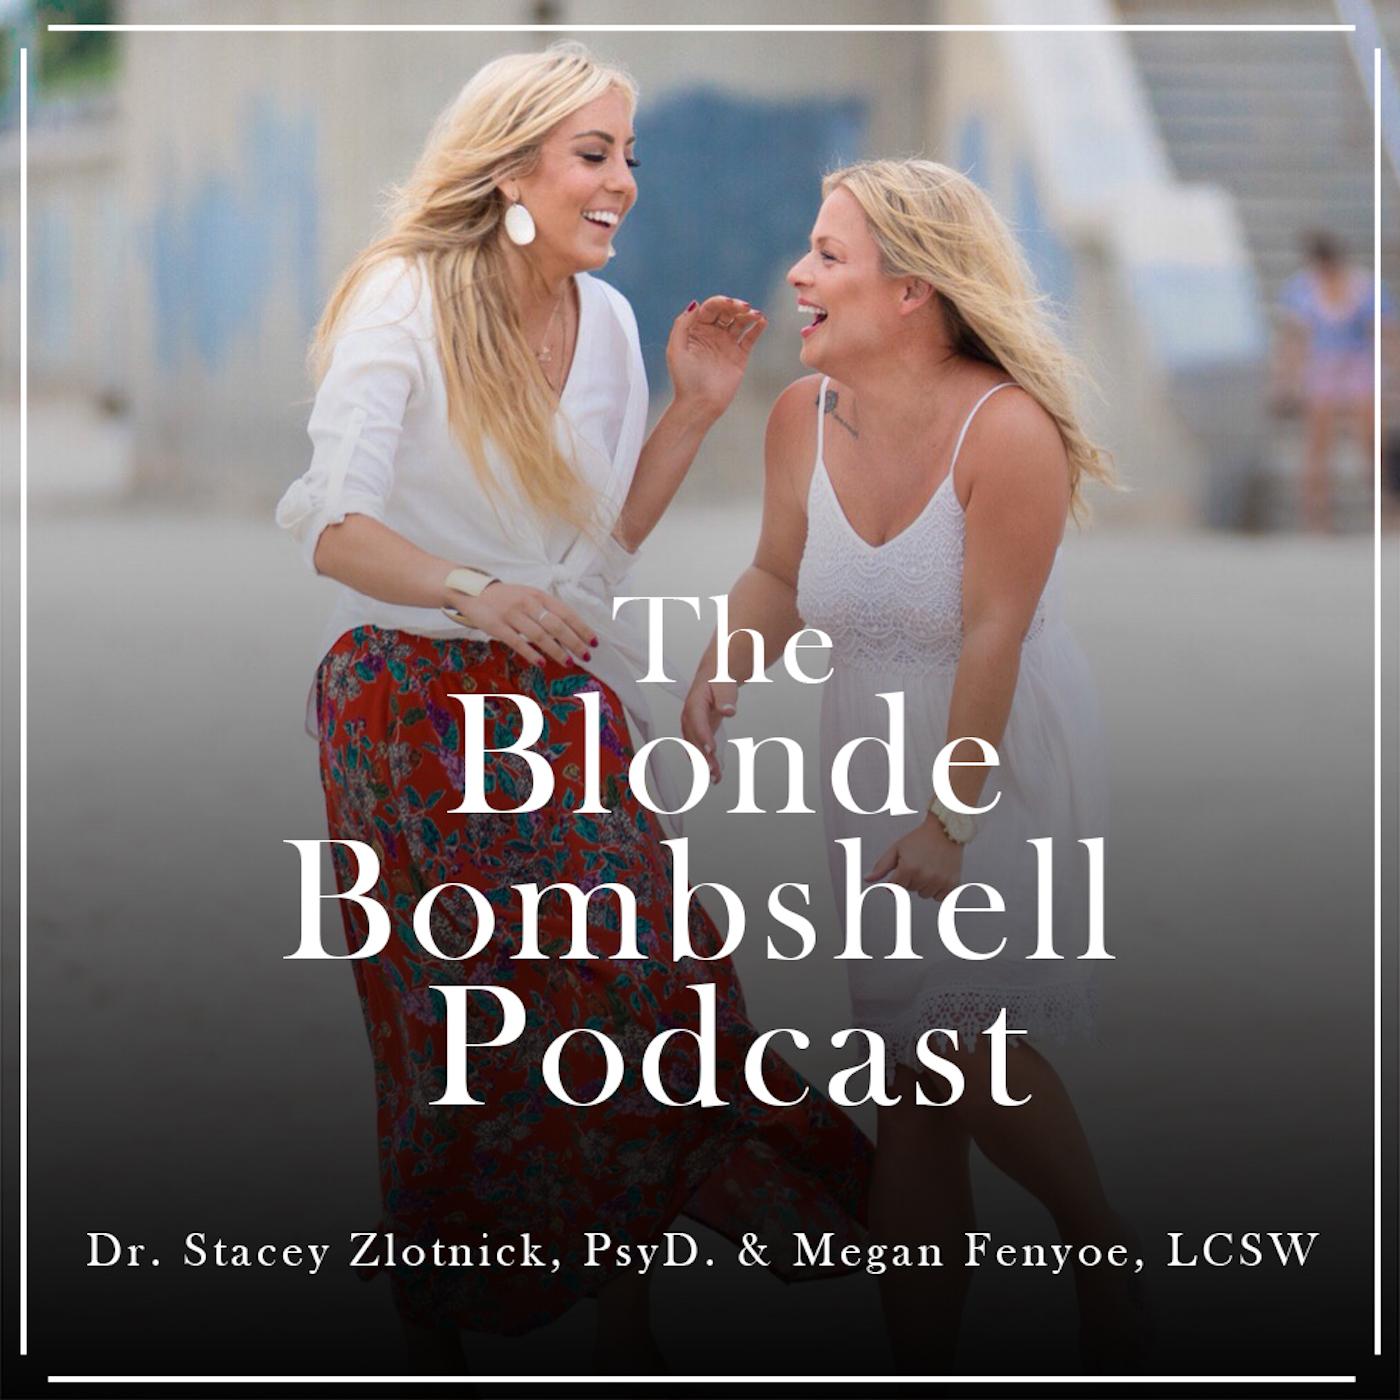 The Blonde Bombshell Podcast show art